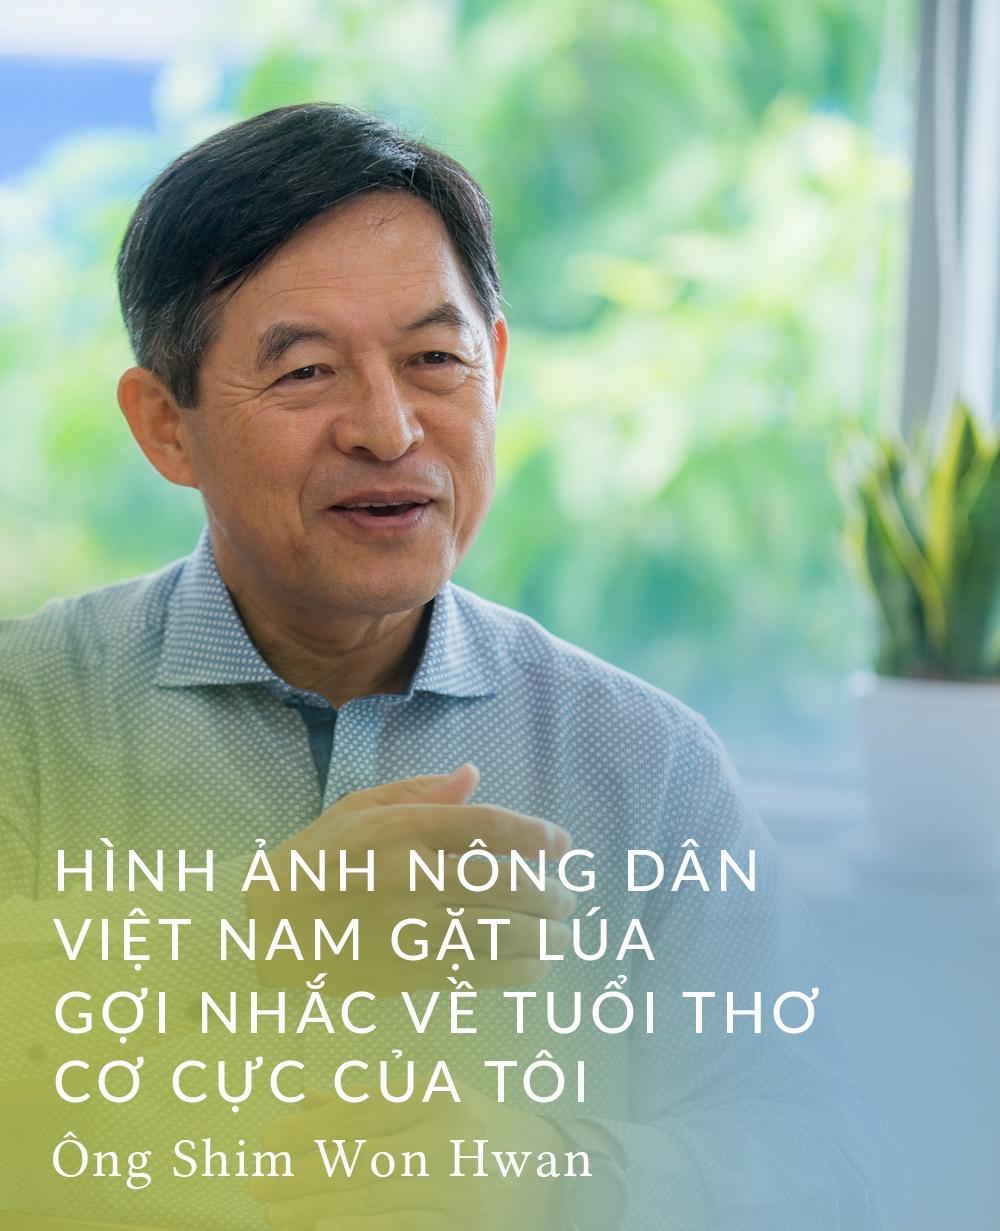 'Nhan vien nguoi Viet lam nen thanh cong cua Samsung Viet Nam' hinh anh 4